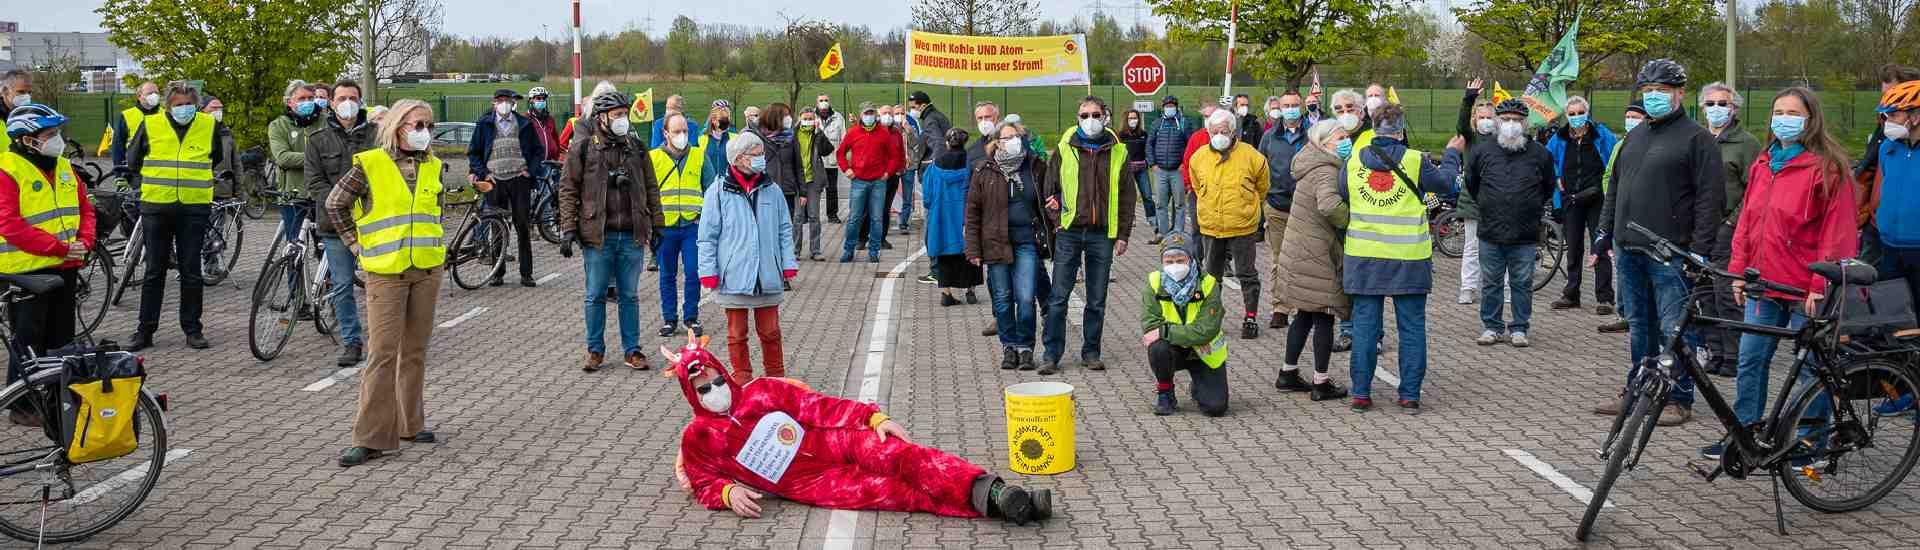 Mahnwache Tschernobyl & THTR-300 in Hamm-Uentrop, 25.04.2021